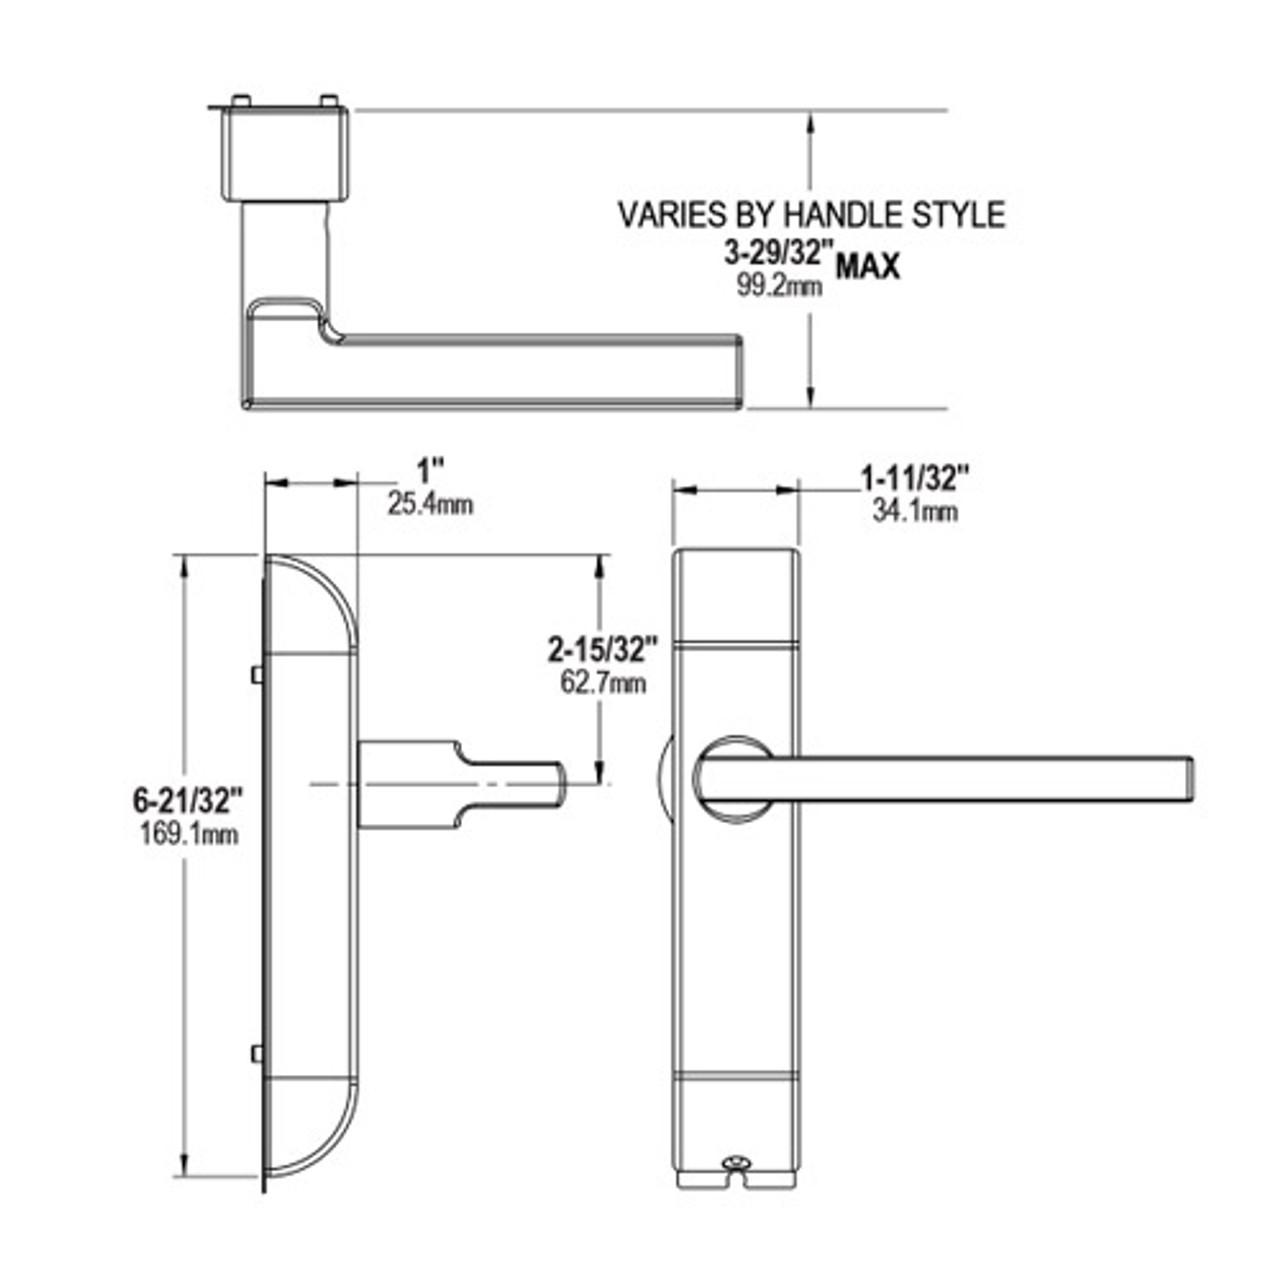 4600-MW-511-US32 Adams Rite MW Designer handle Dimensional View